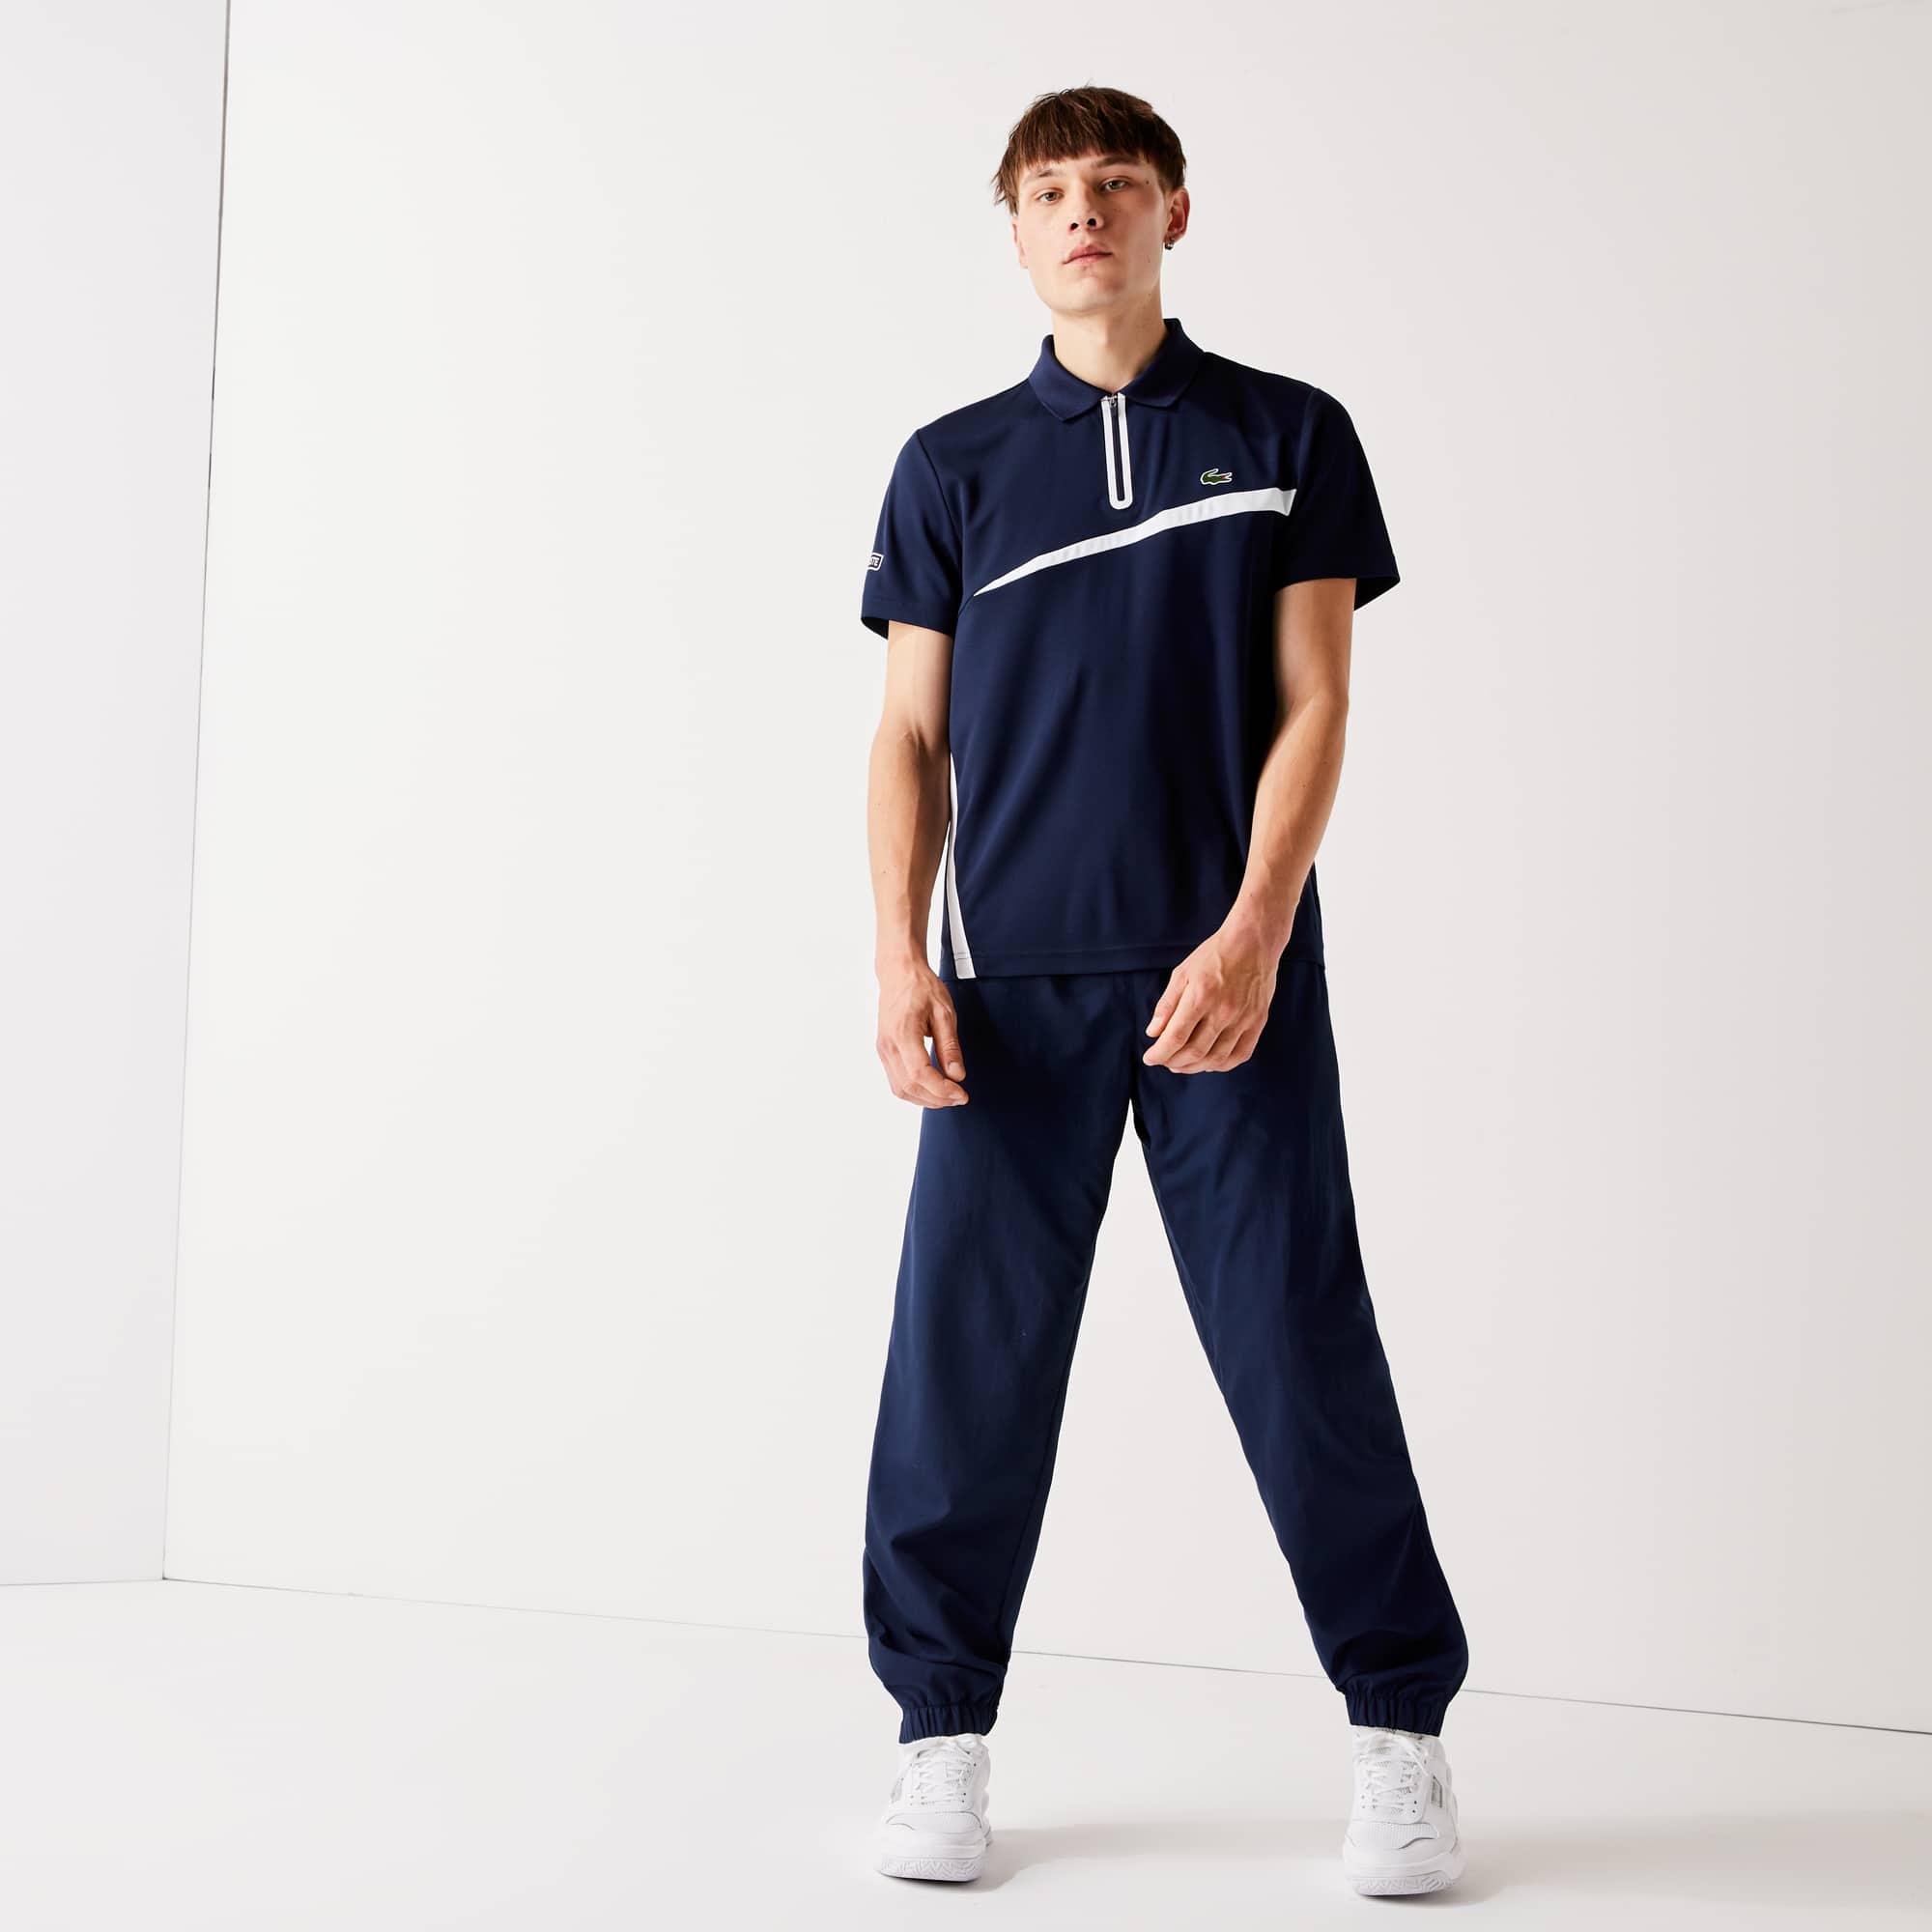 2b6a46a0e3 Polo shirts, shoes, leather goods | LACOSTE Online Boutique